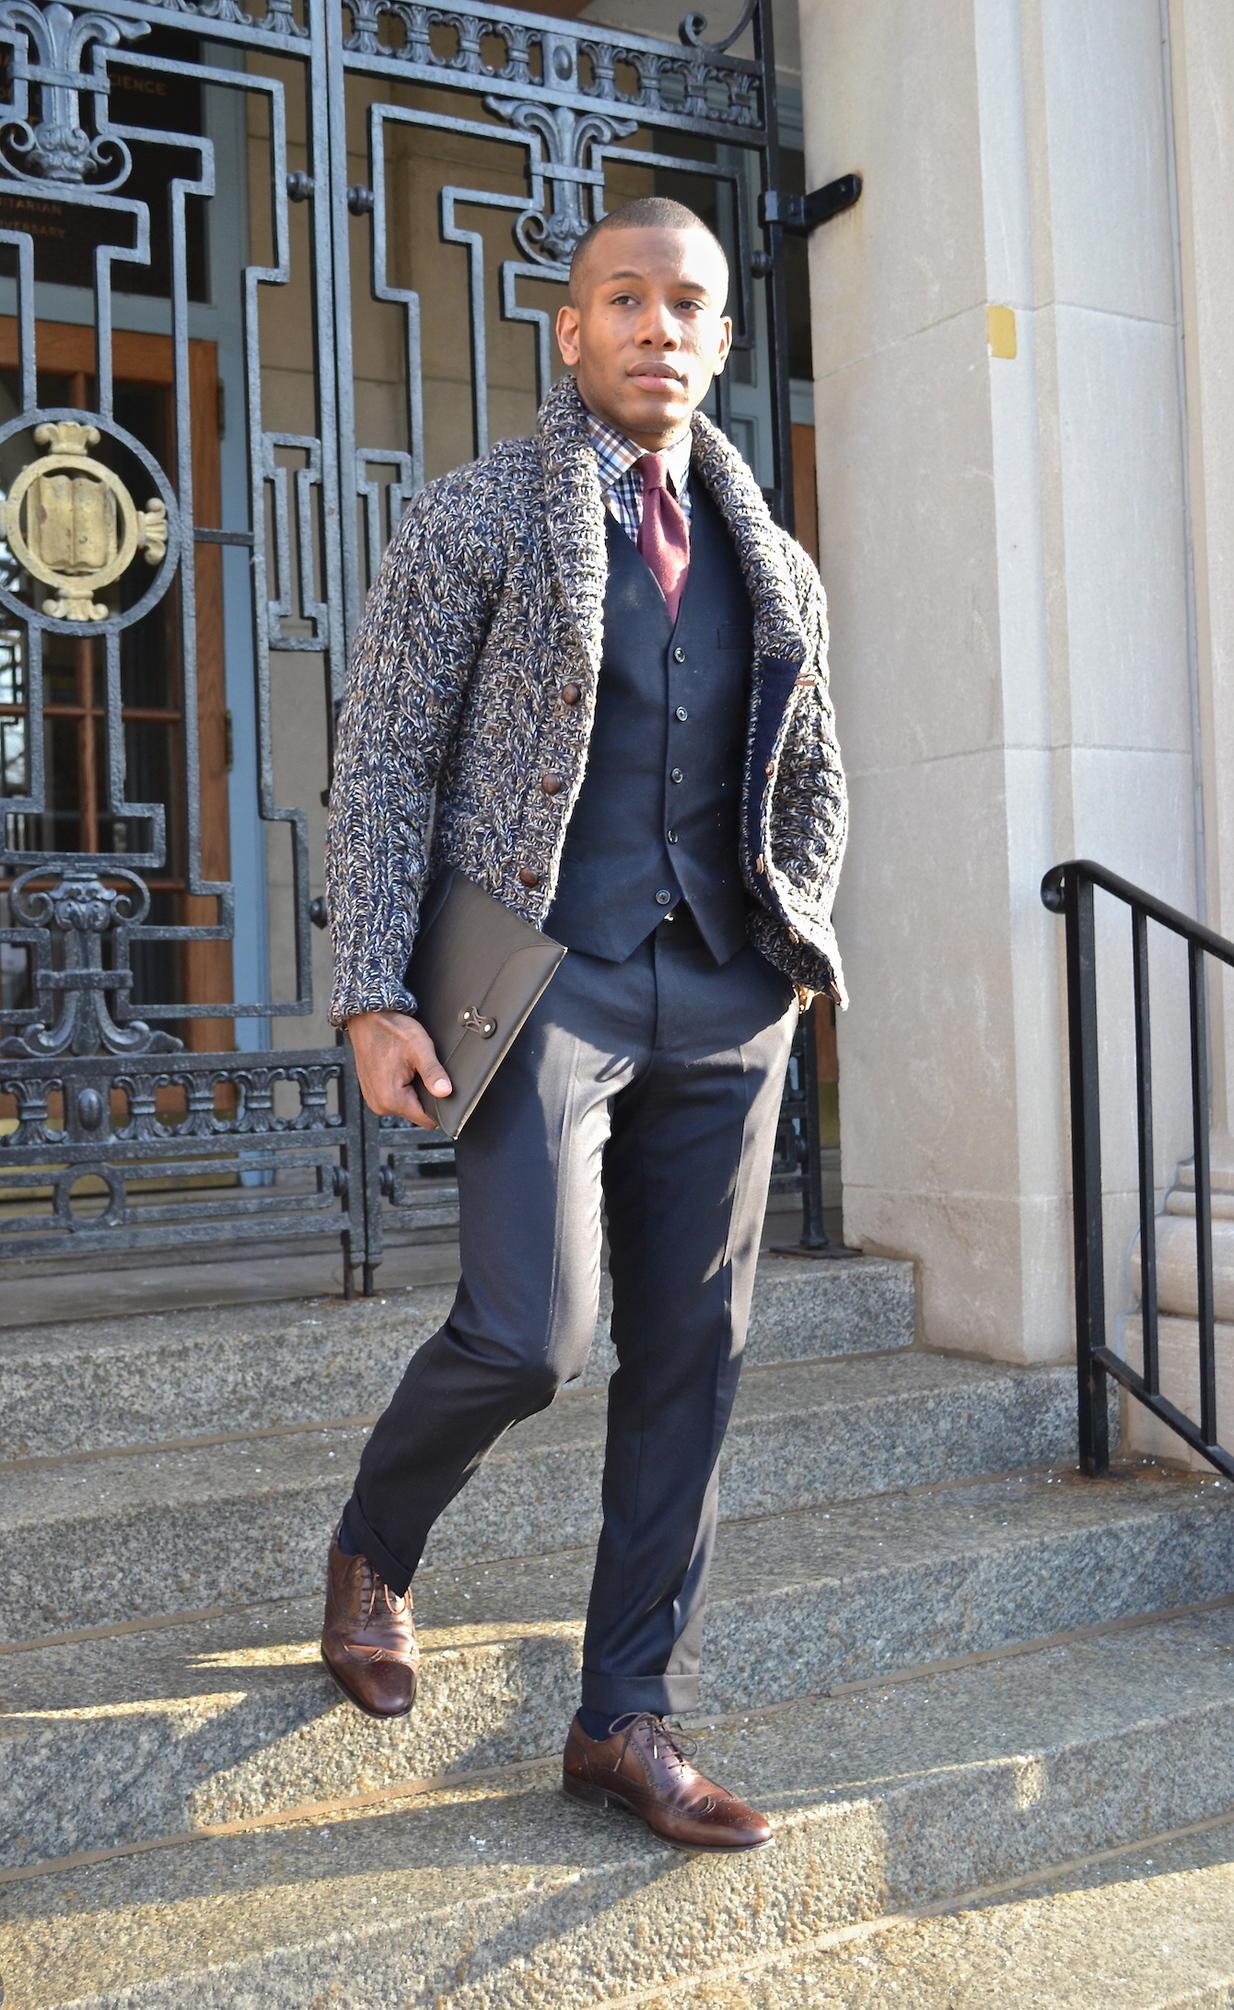 Shawl cardigan over suit